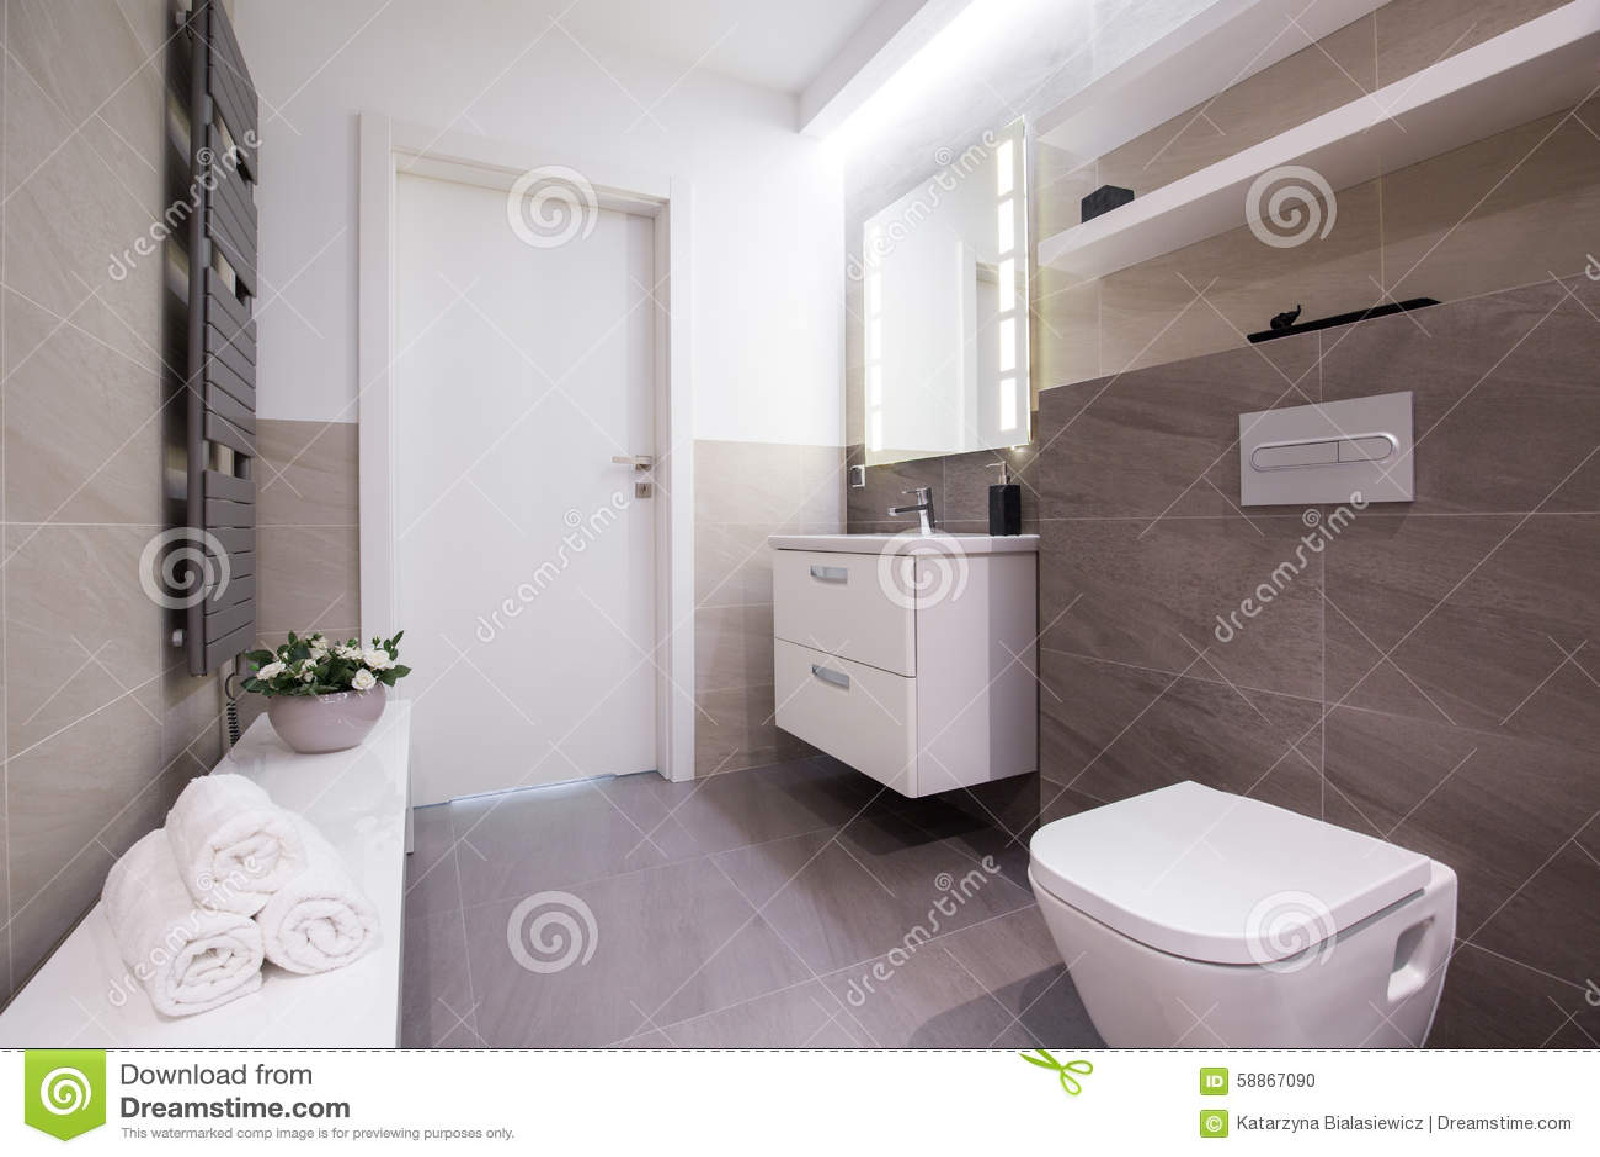 Rymligt ljust badrum foton – 87 rymligt ljust badrum bilder ...